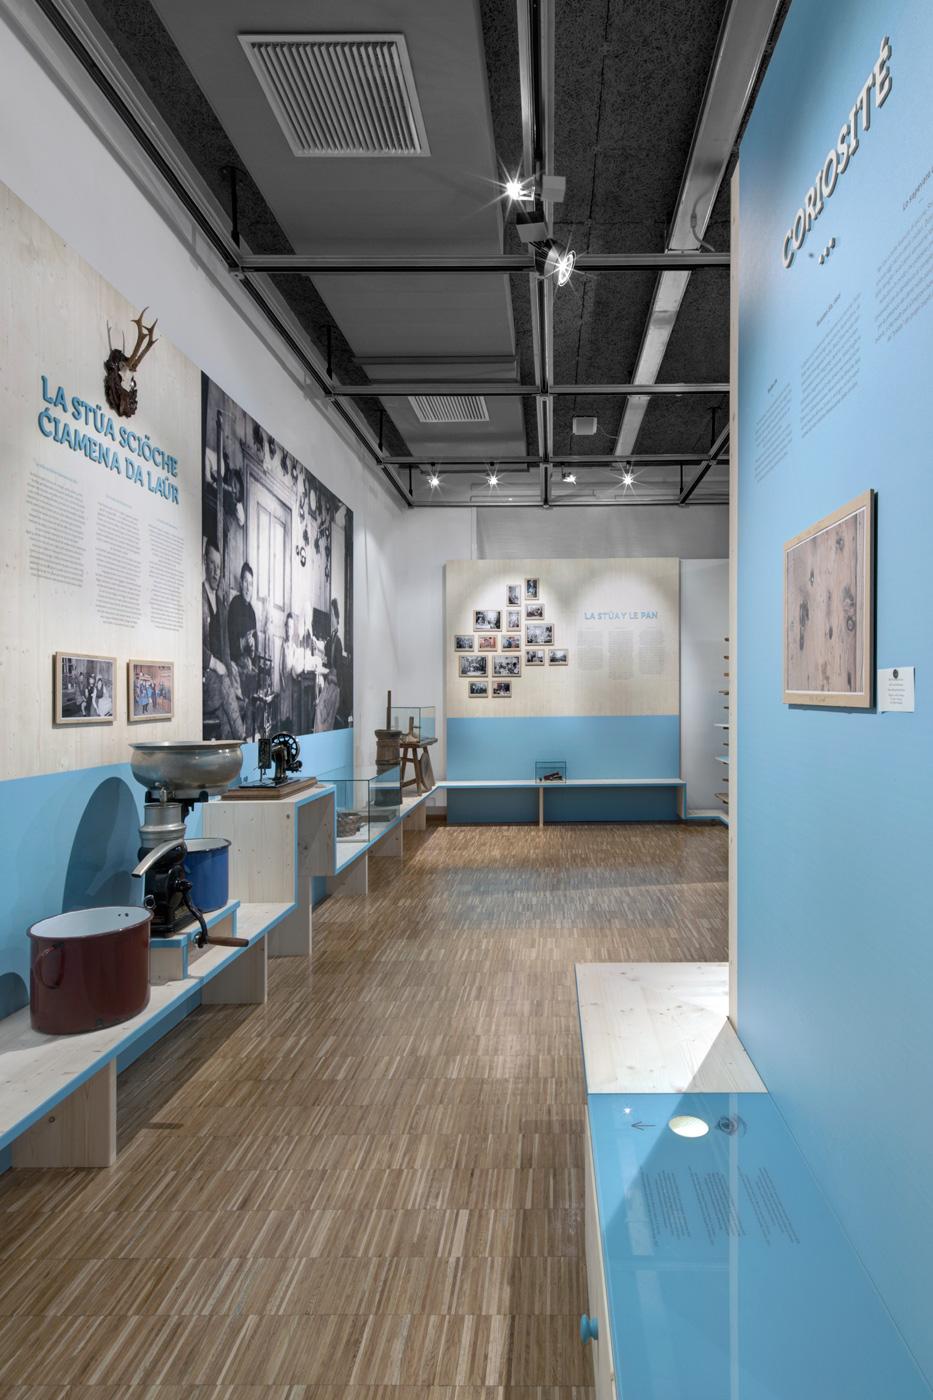 Museum_Le-Coer-dla-Ciasa_12_IMG_0031_GW.jpg